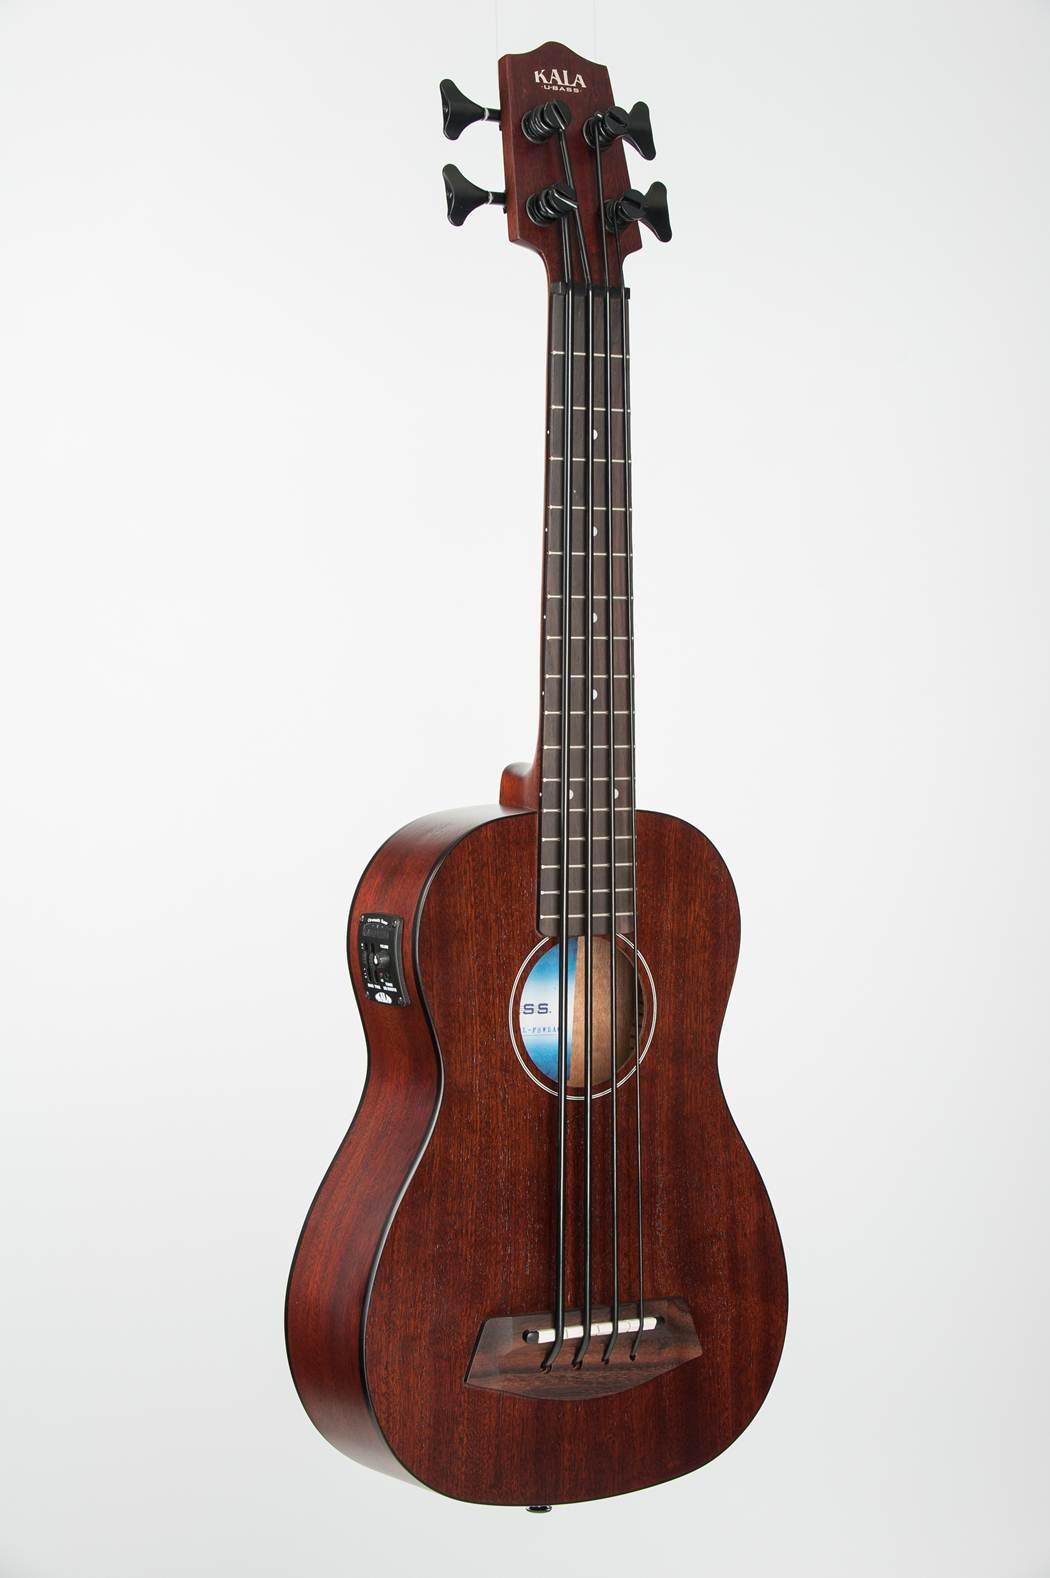 kala ubass rumbler laminated mahogany bass uke boutique. Black Bedroom Furniture Sets. Home Design Ideas